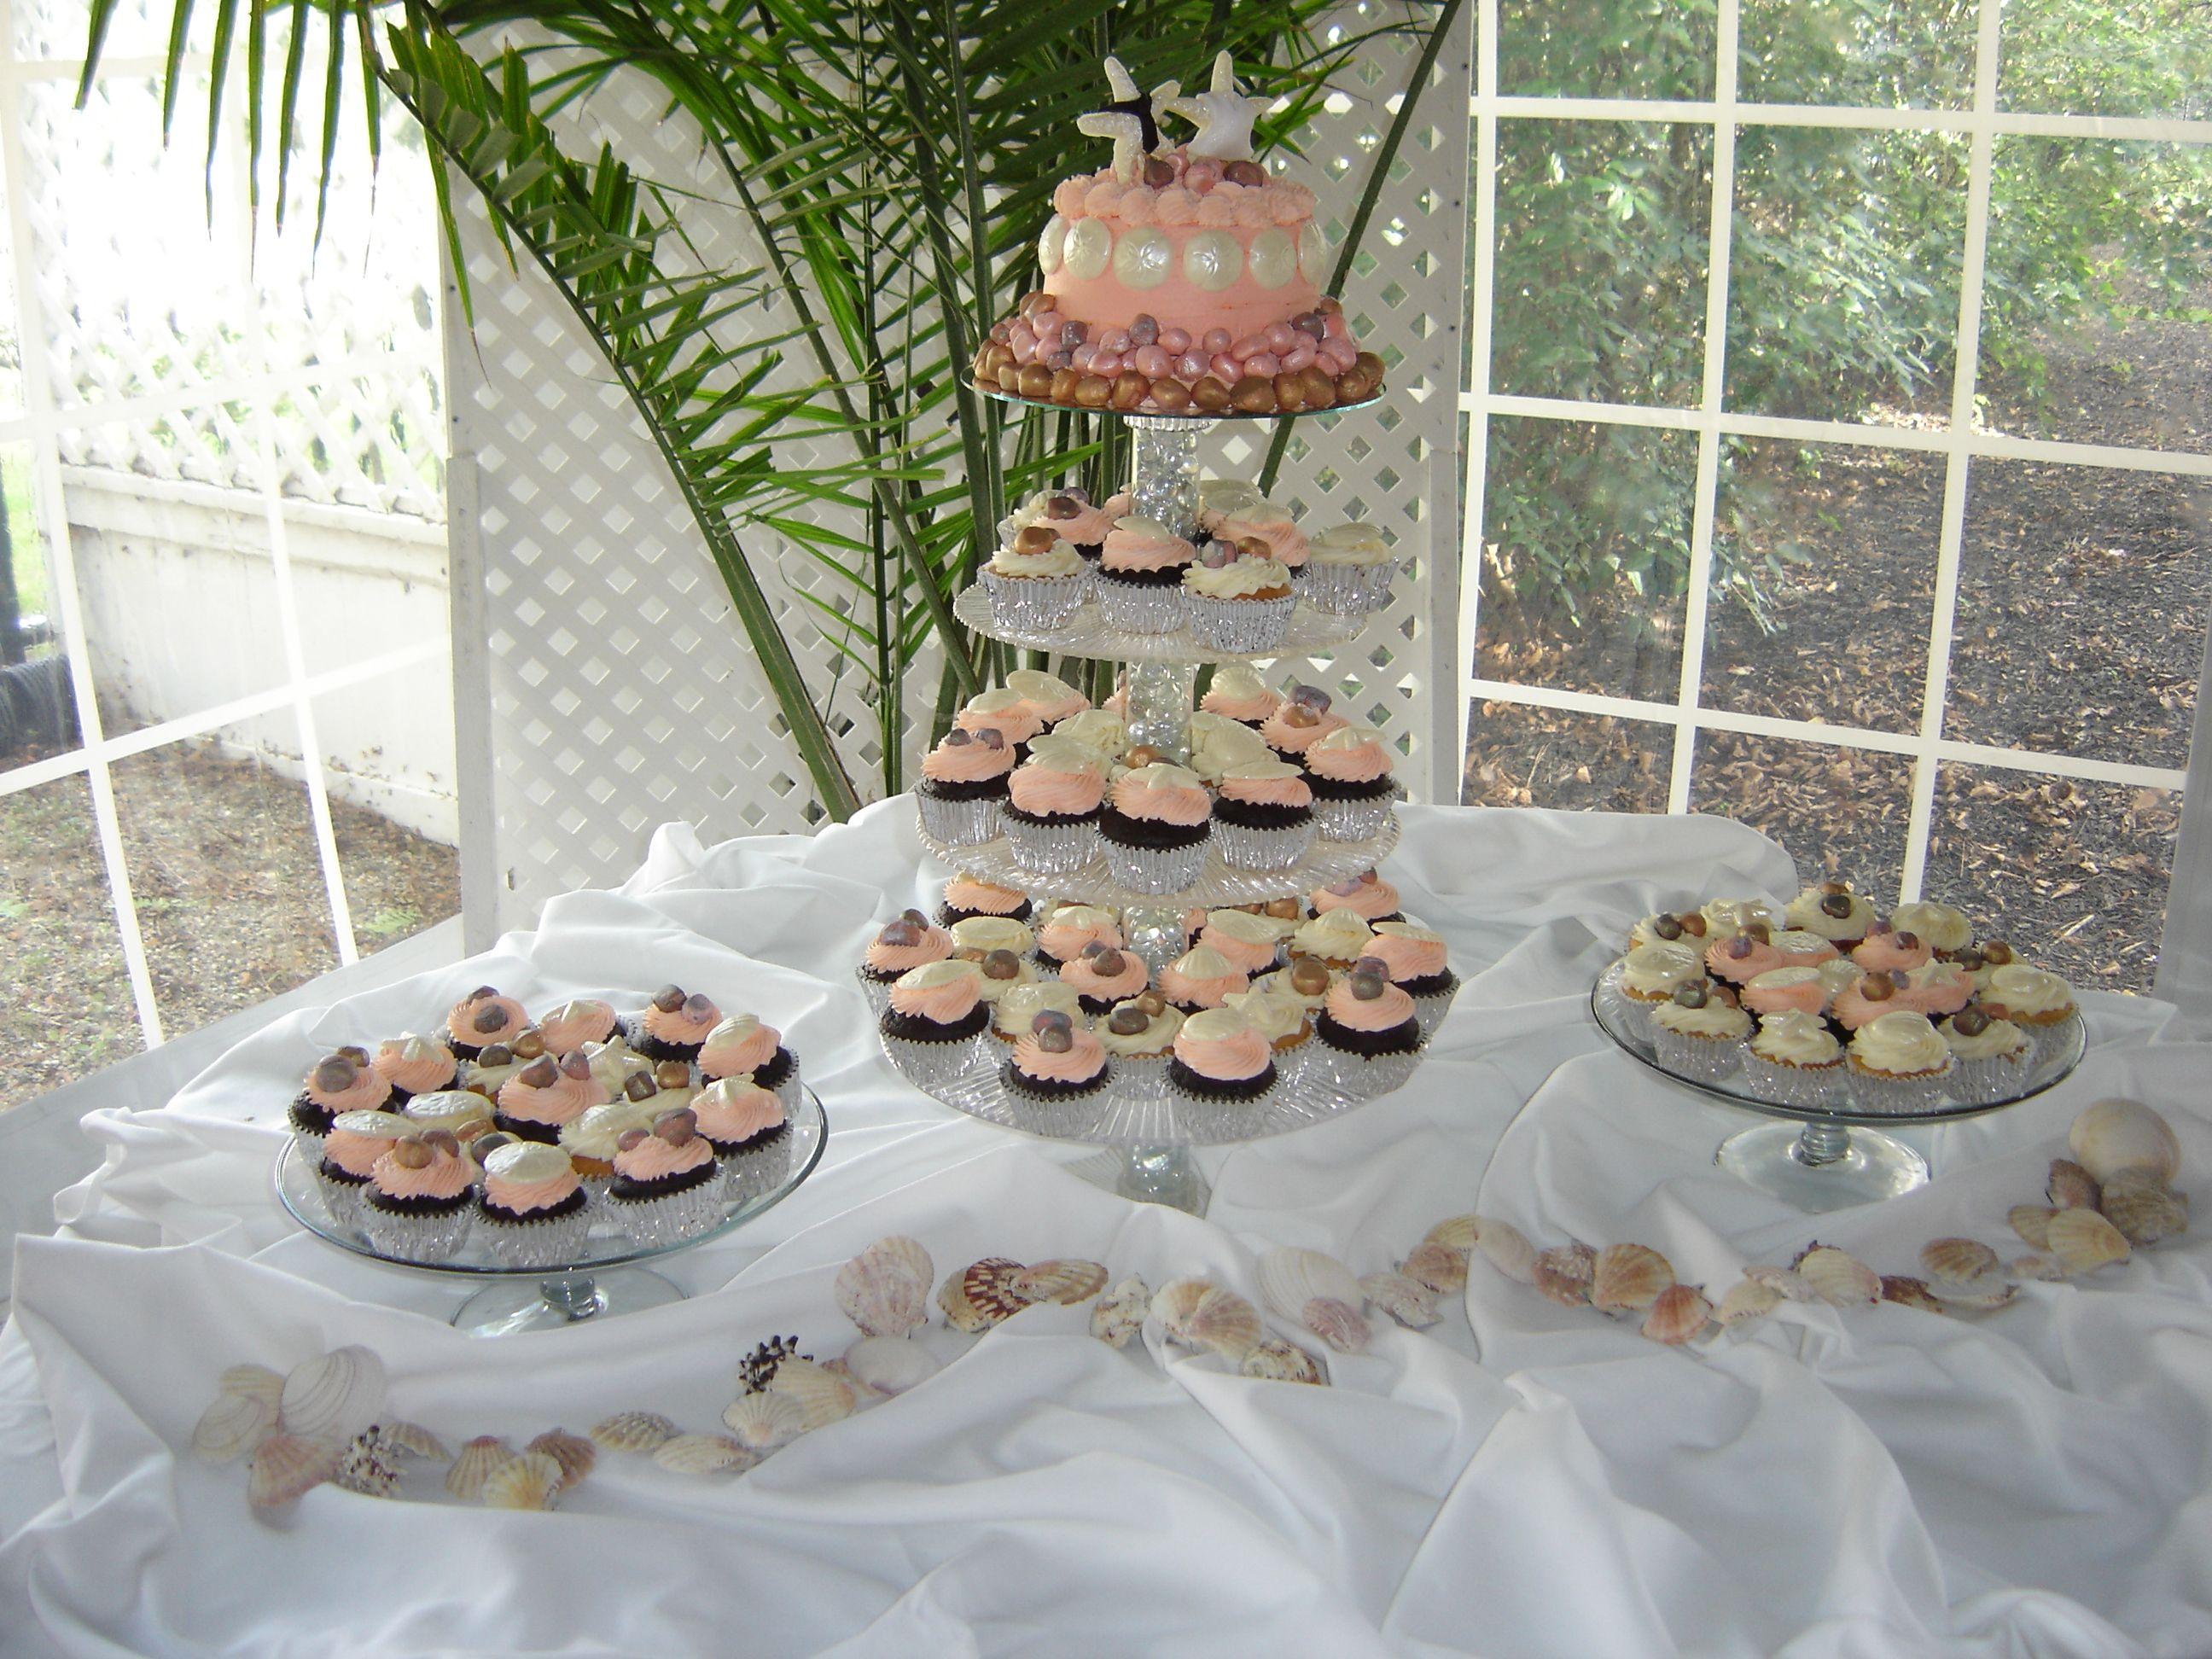 Beach scene cupcake display with bride u groom starfish